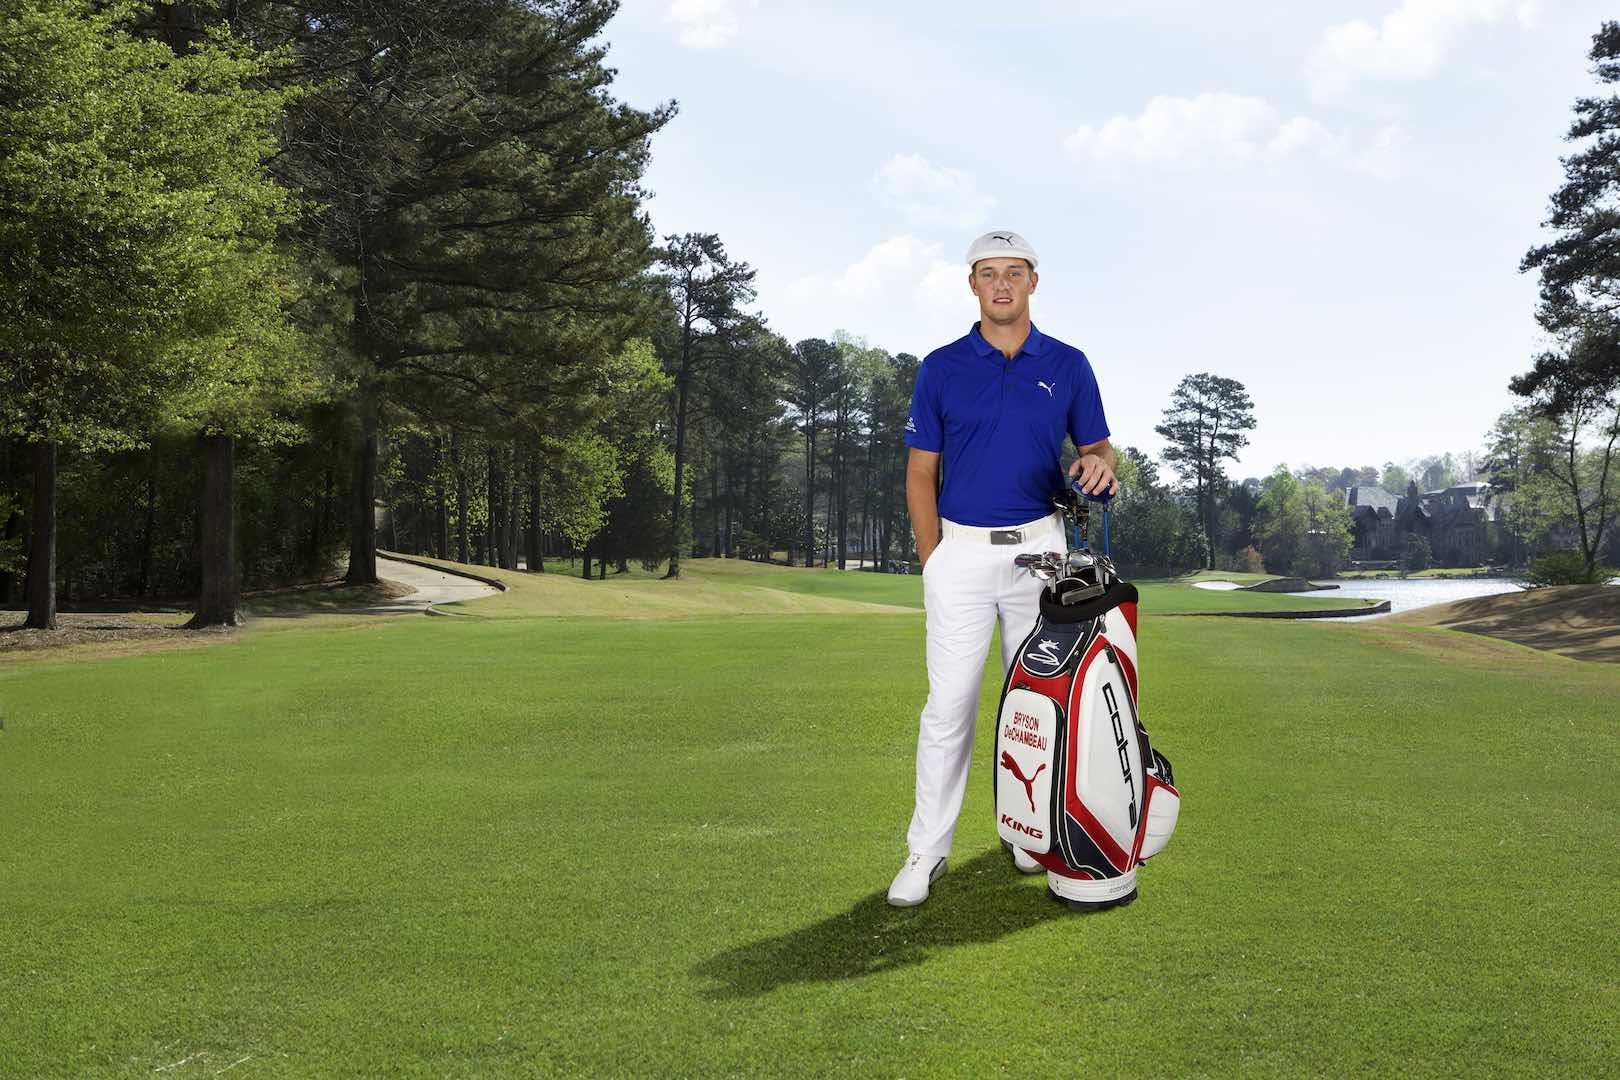 e3d7b75c7b207 Bryson DeChambeau signs with Cobra Puma Golf - GolfPunkHQ